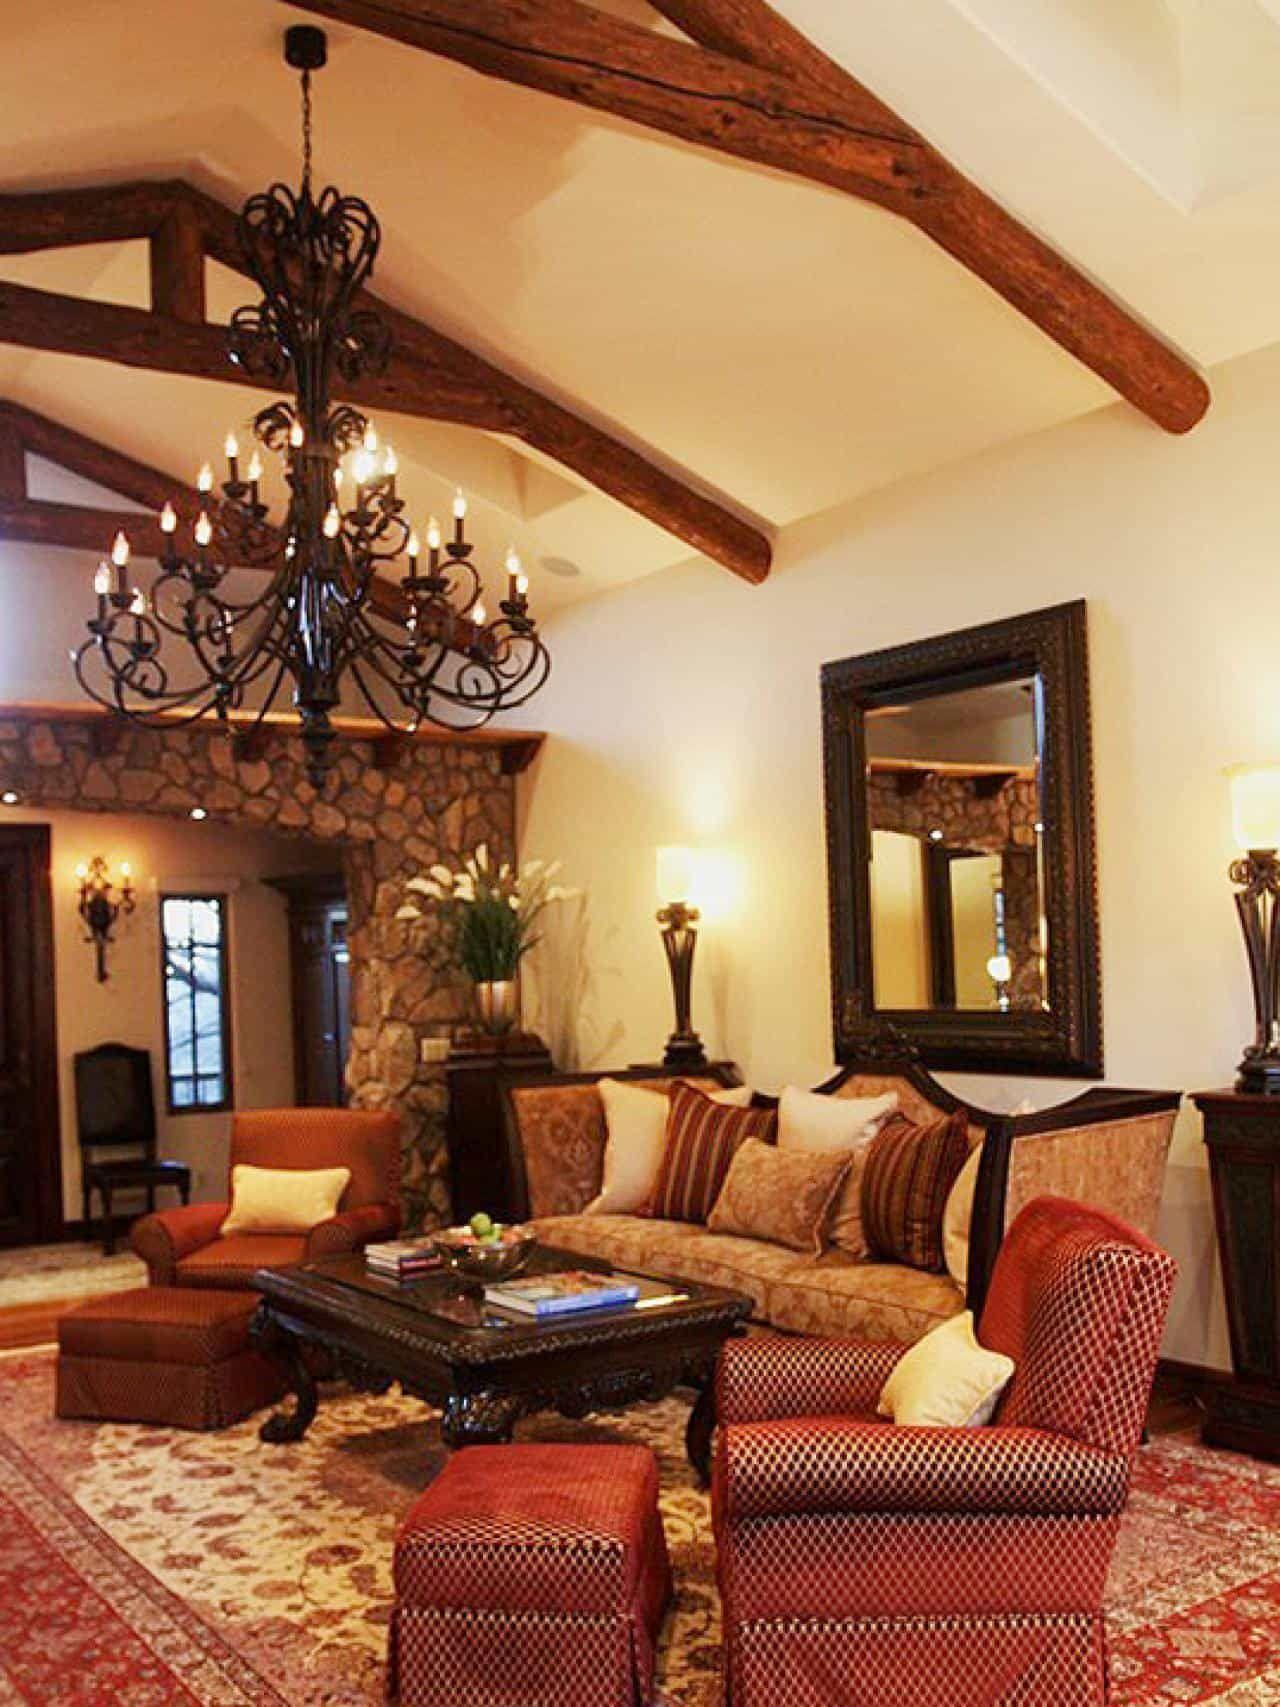 Dashing Spanish Style Furniture in 2020 | Moroccan decor ...